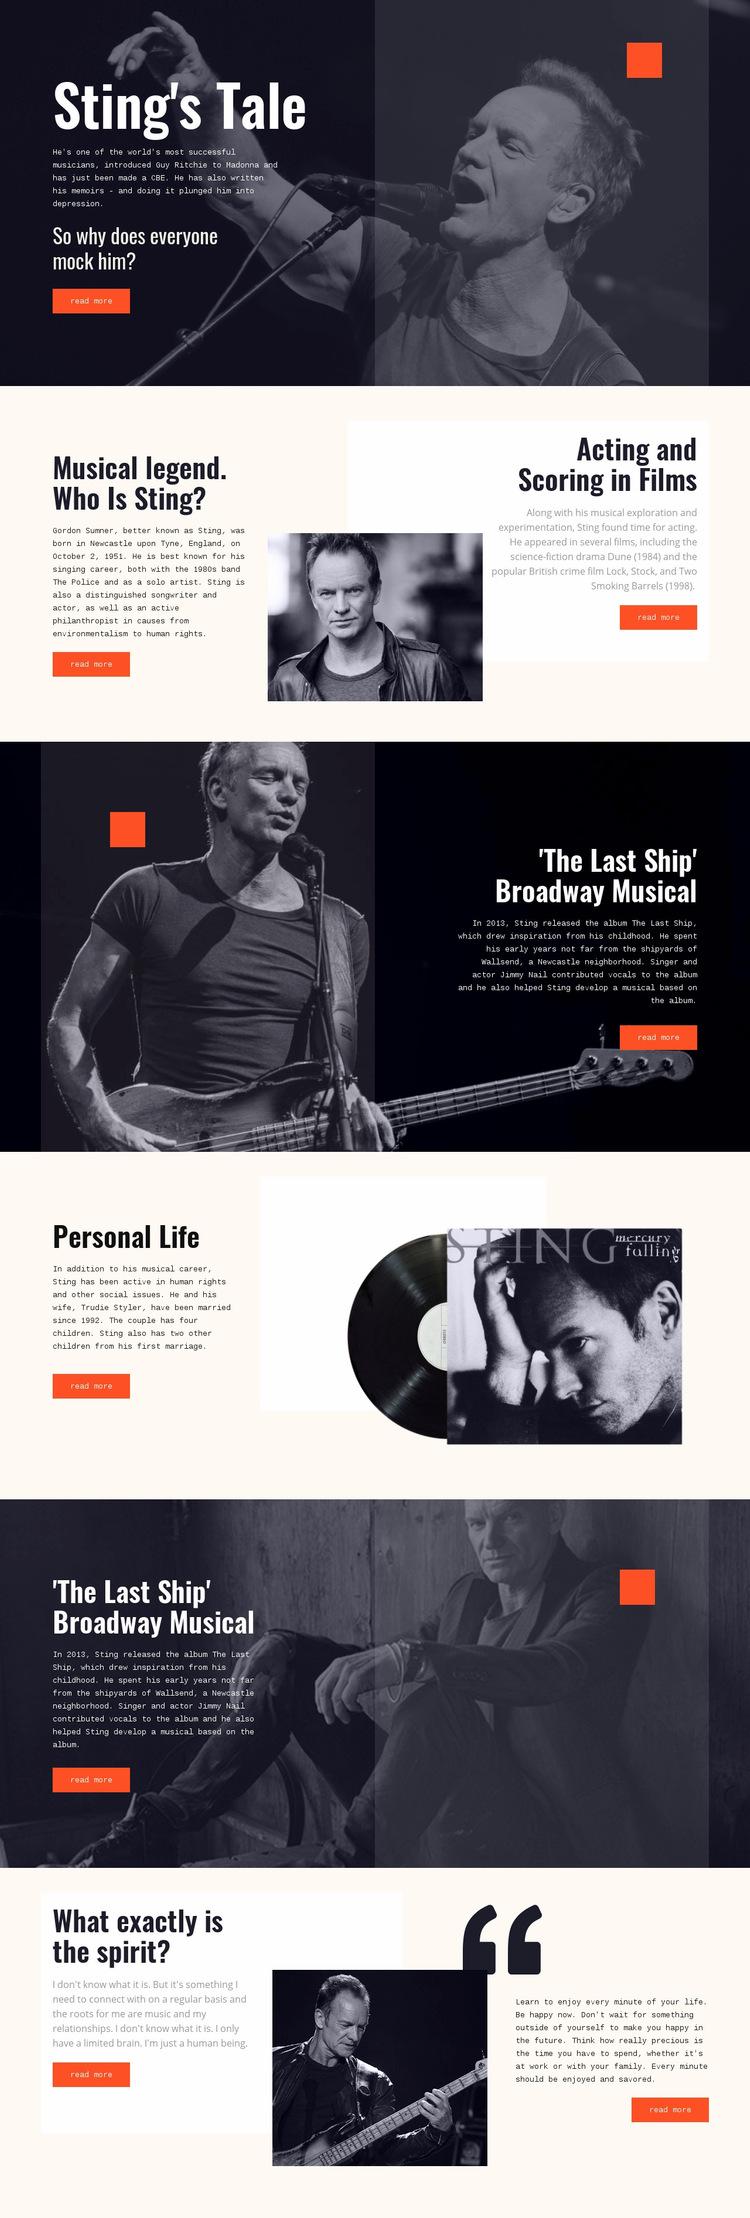 Sting Tale Web Page Design